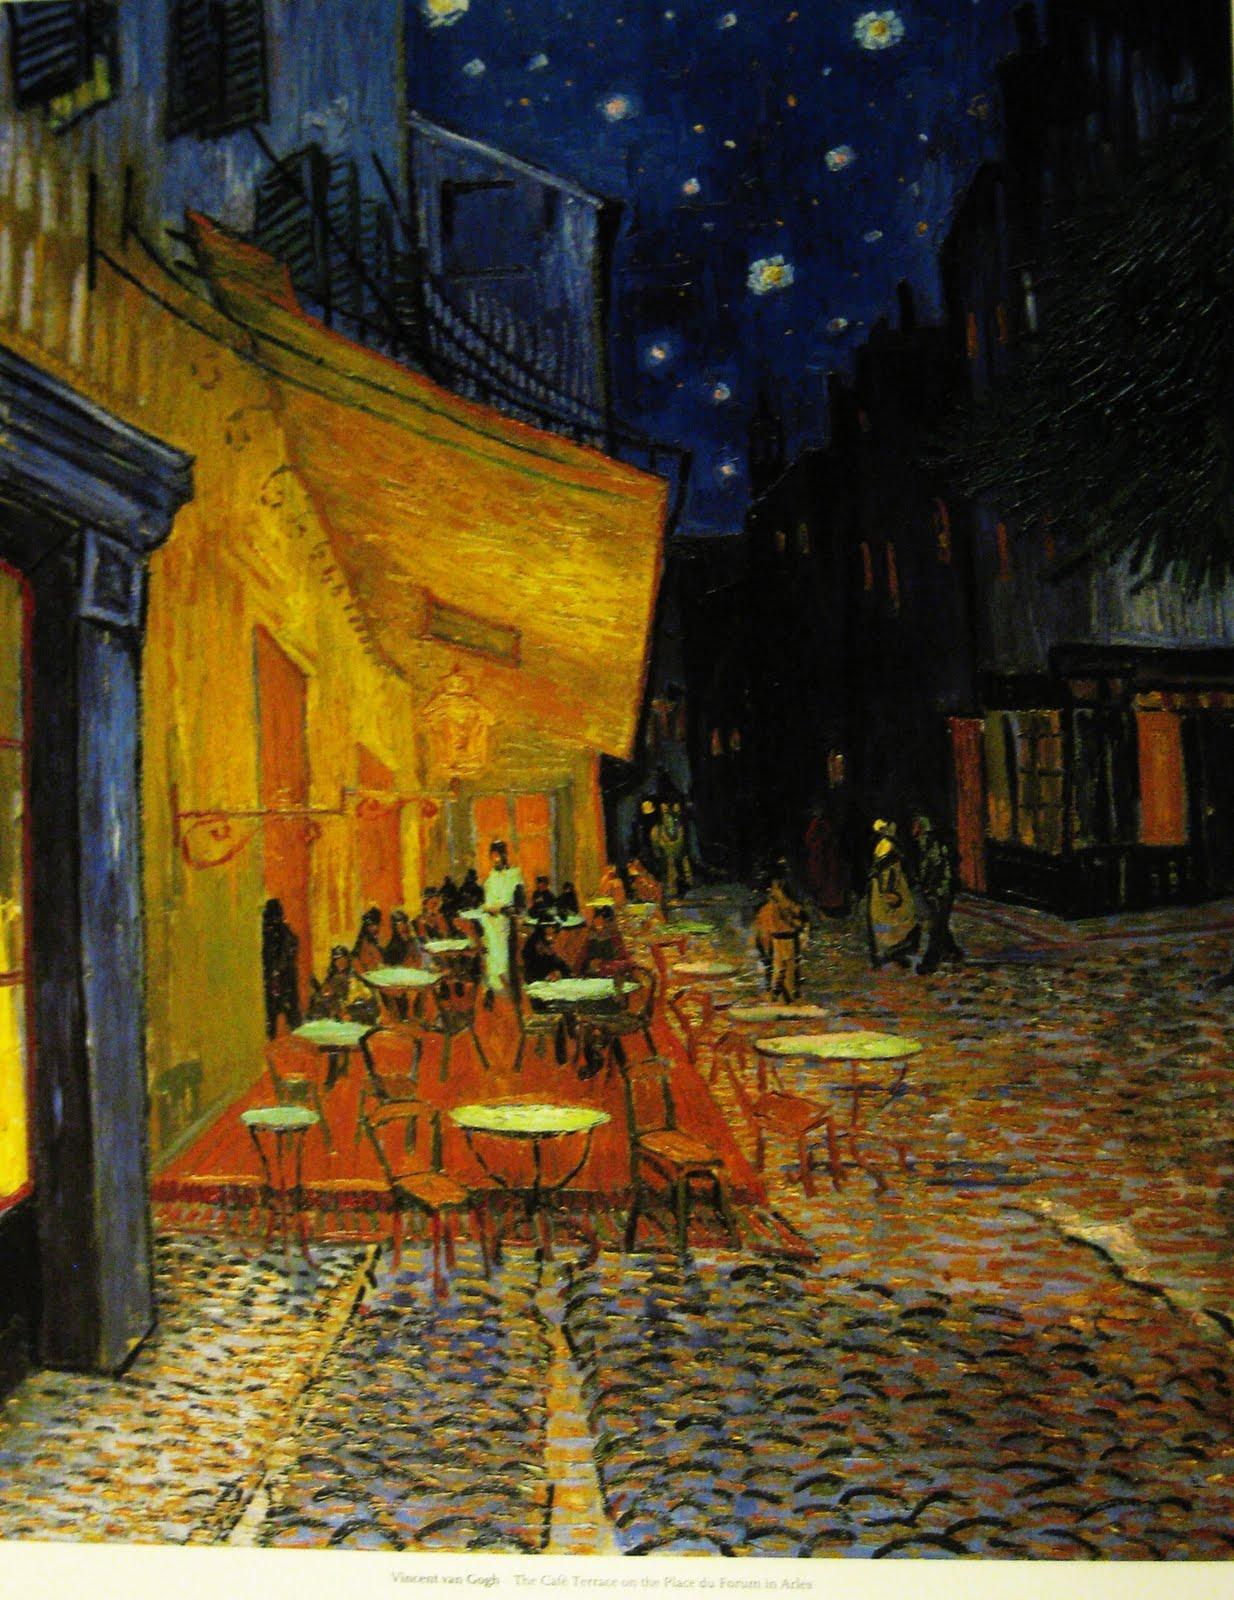 картина ван гога ночная терраса кафе наш